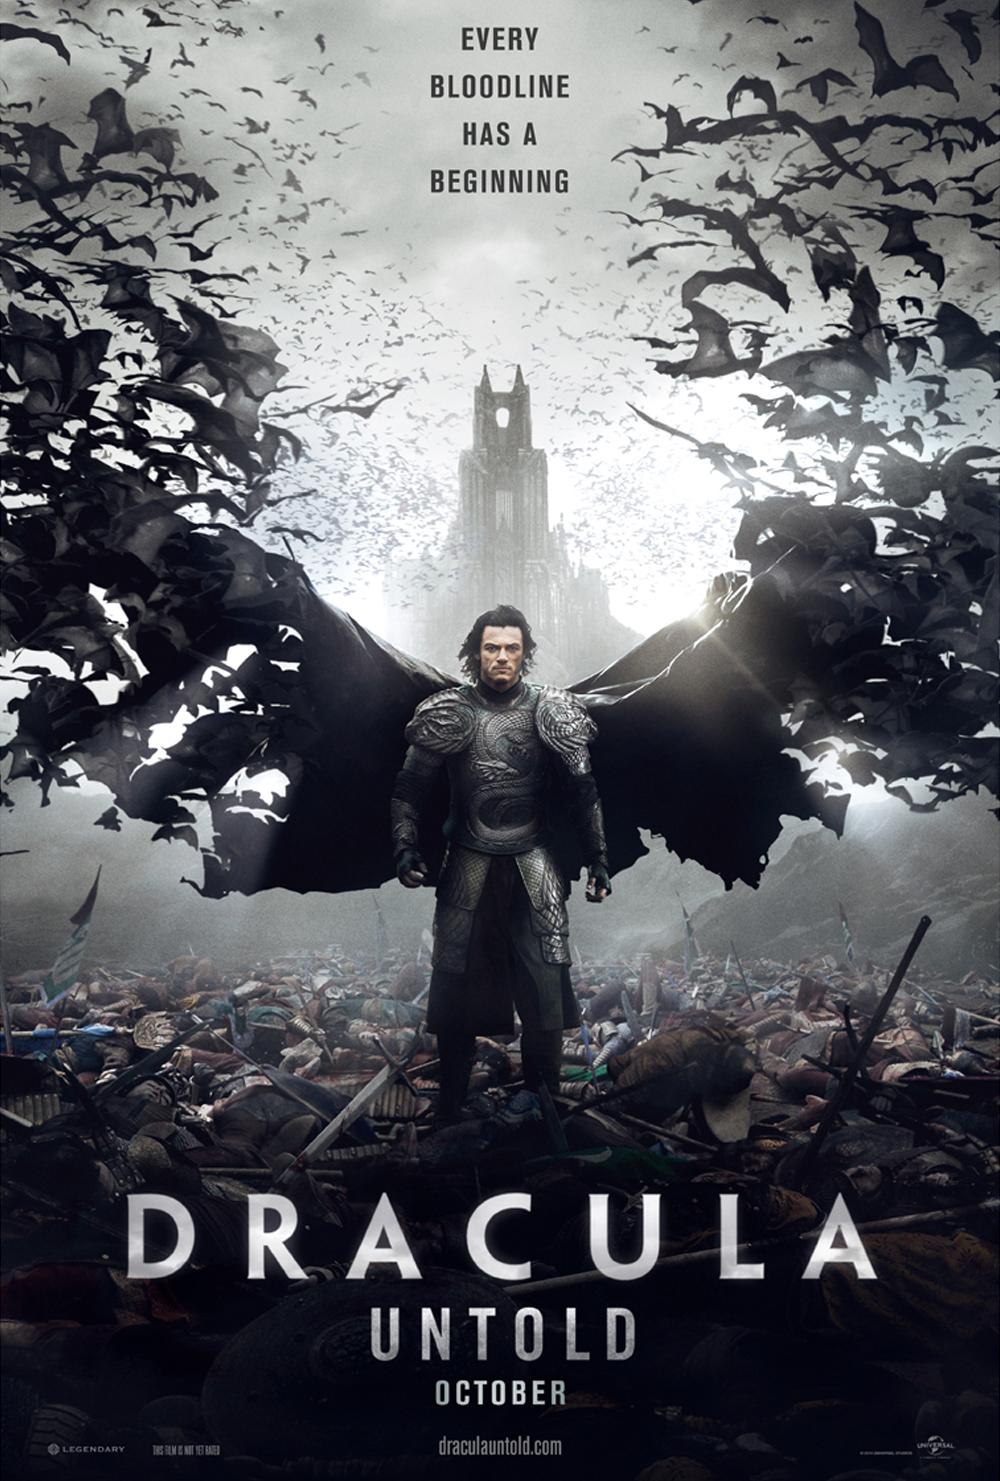 dracula_untold_poster.jpg